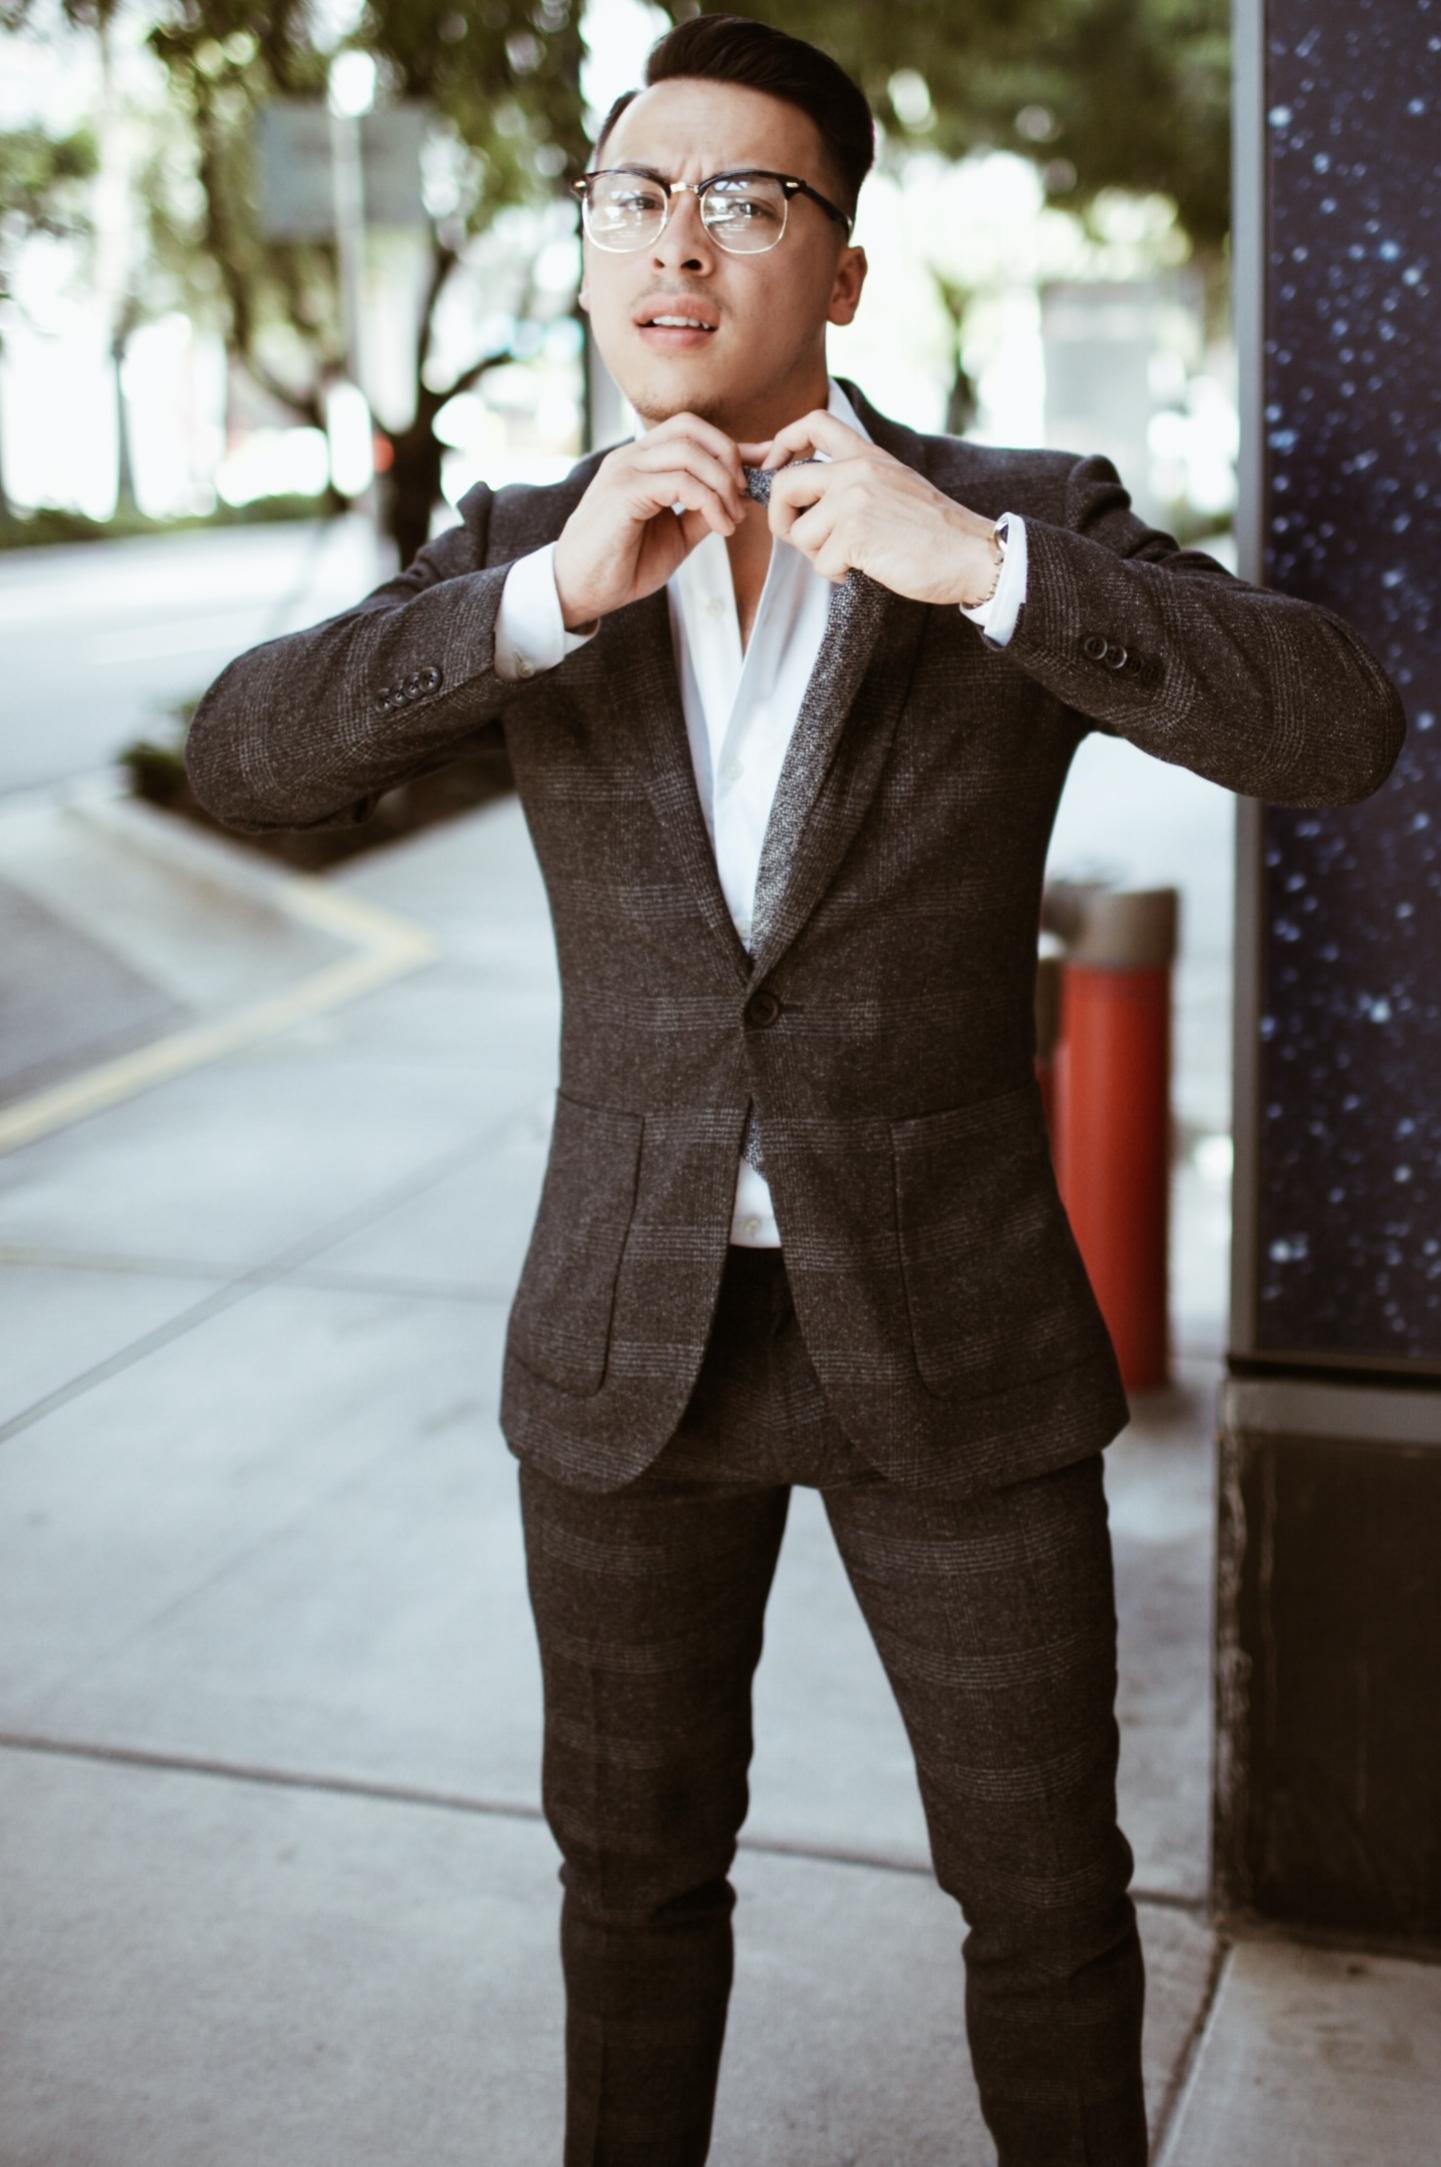 5 Key Items - Every Man Needs In His Wardrobe